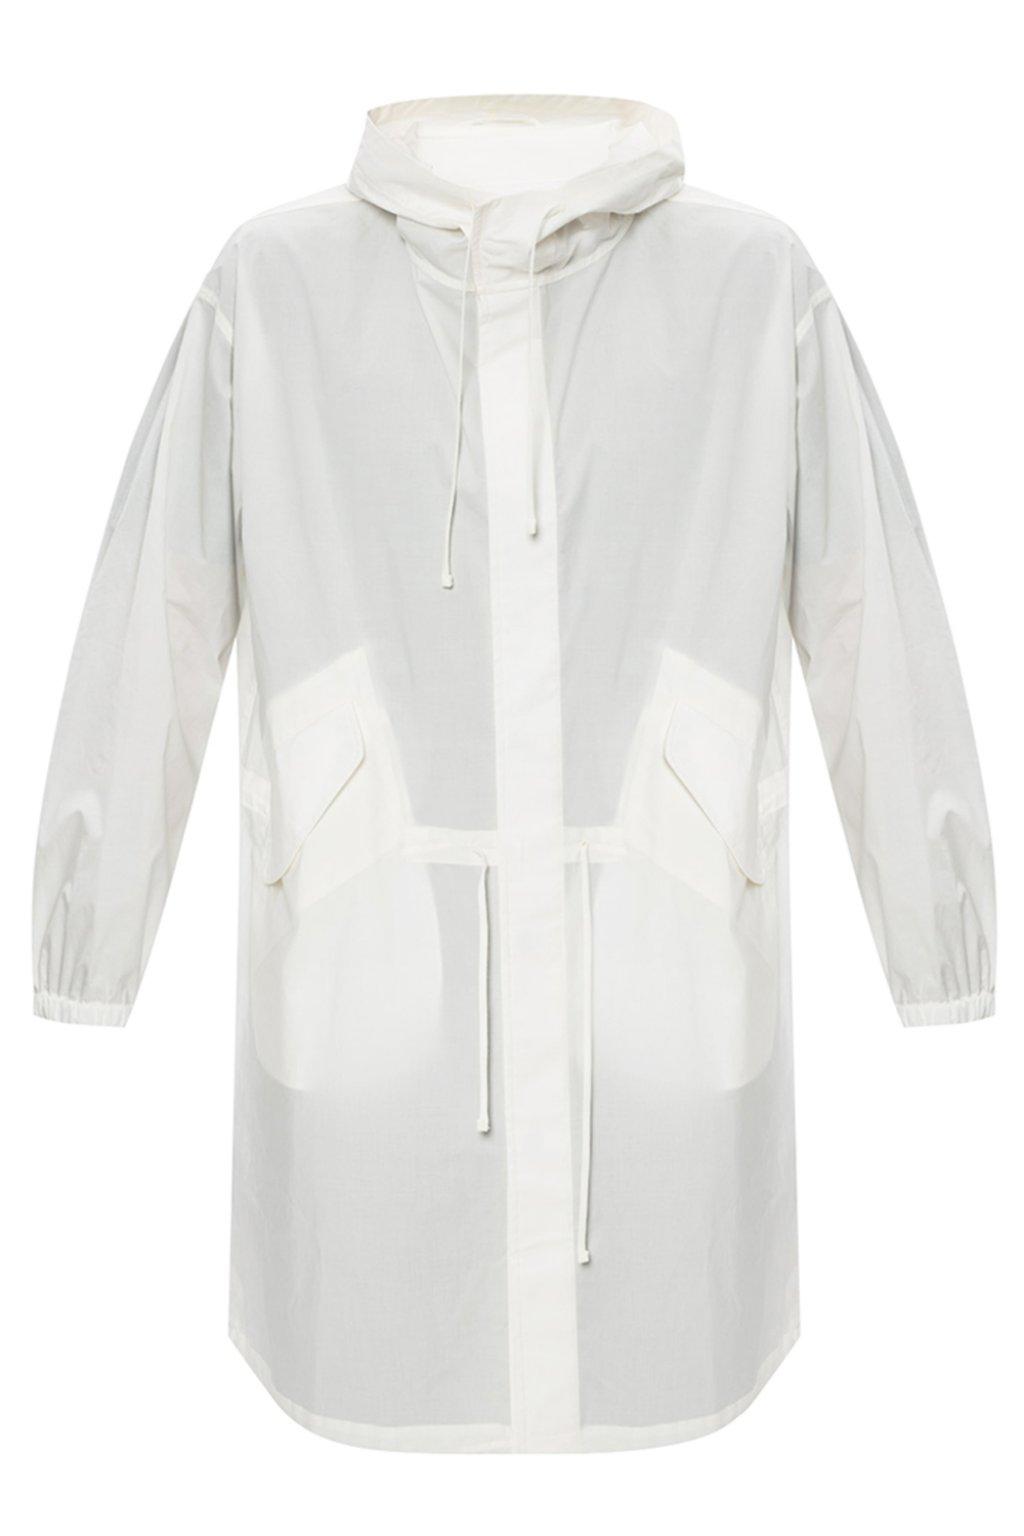 JIL SANDER Hooded coat